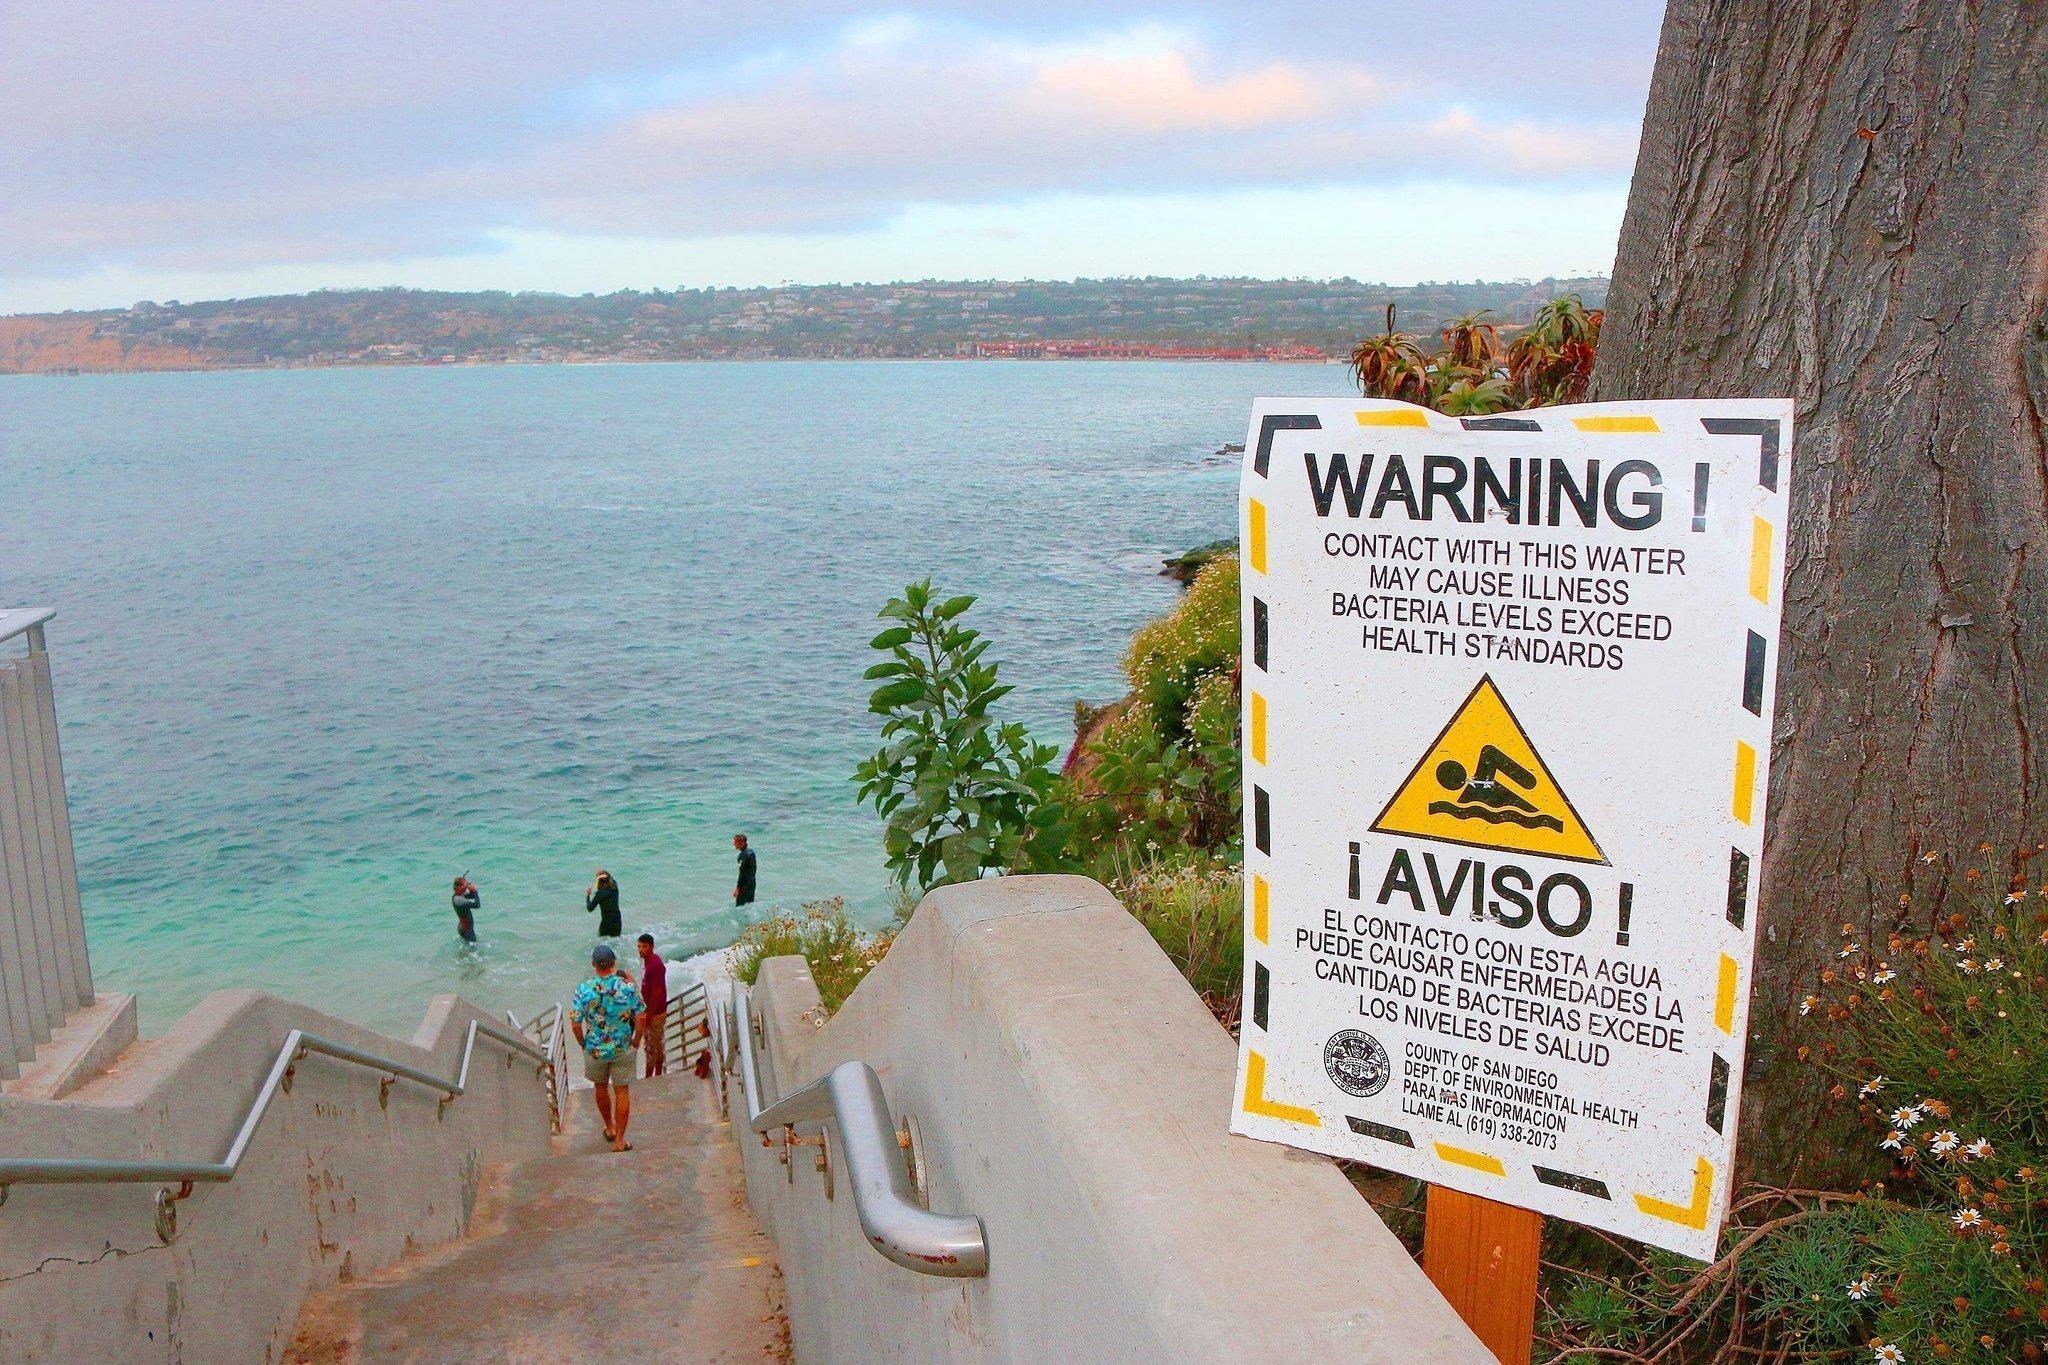 San Diego Health Department >> It's swim at your own risk at La Jolla Cove - La Jolla Light